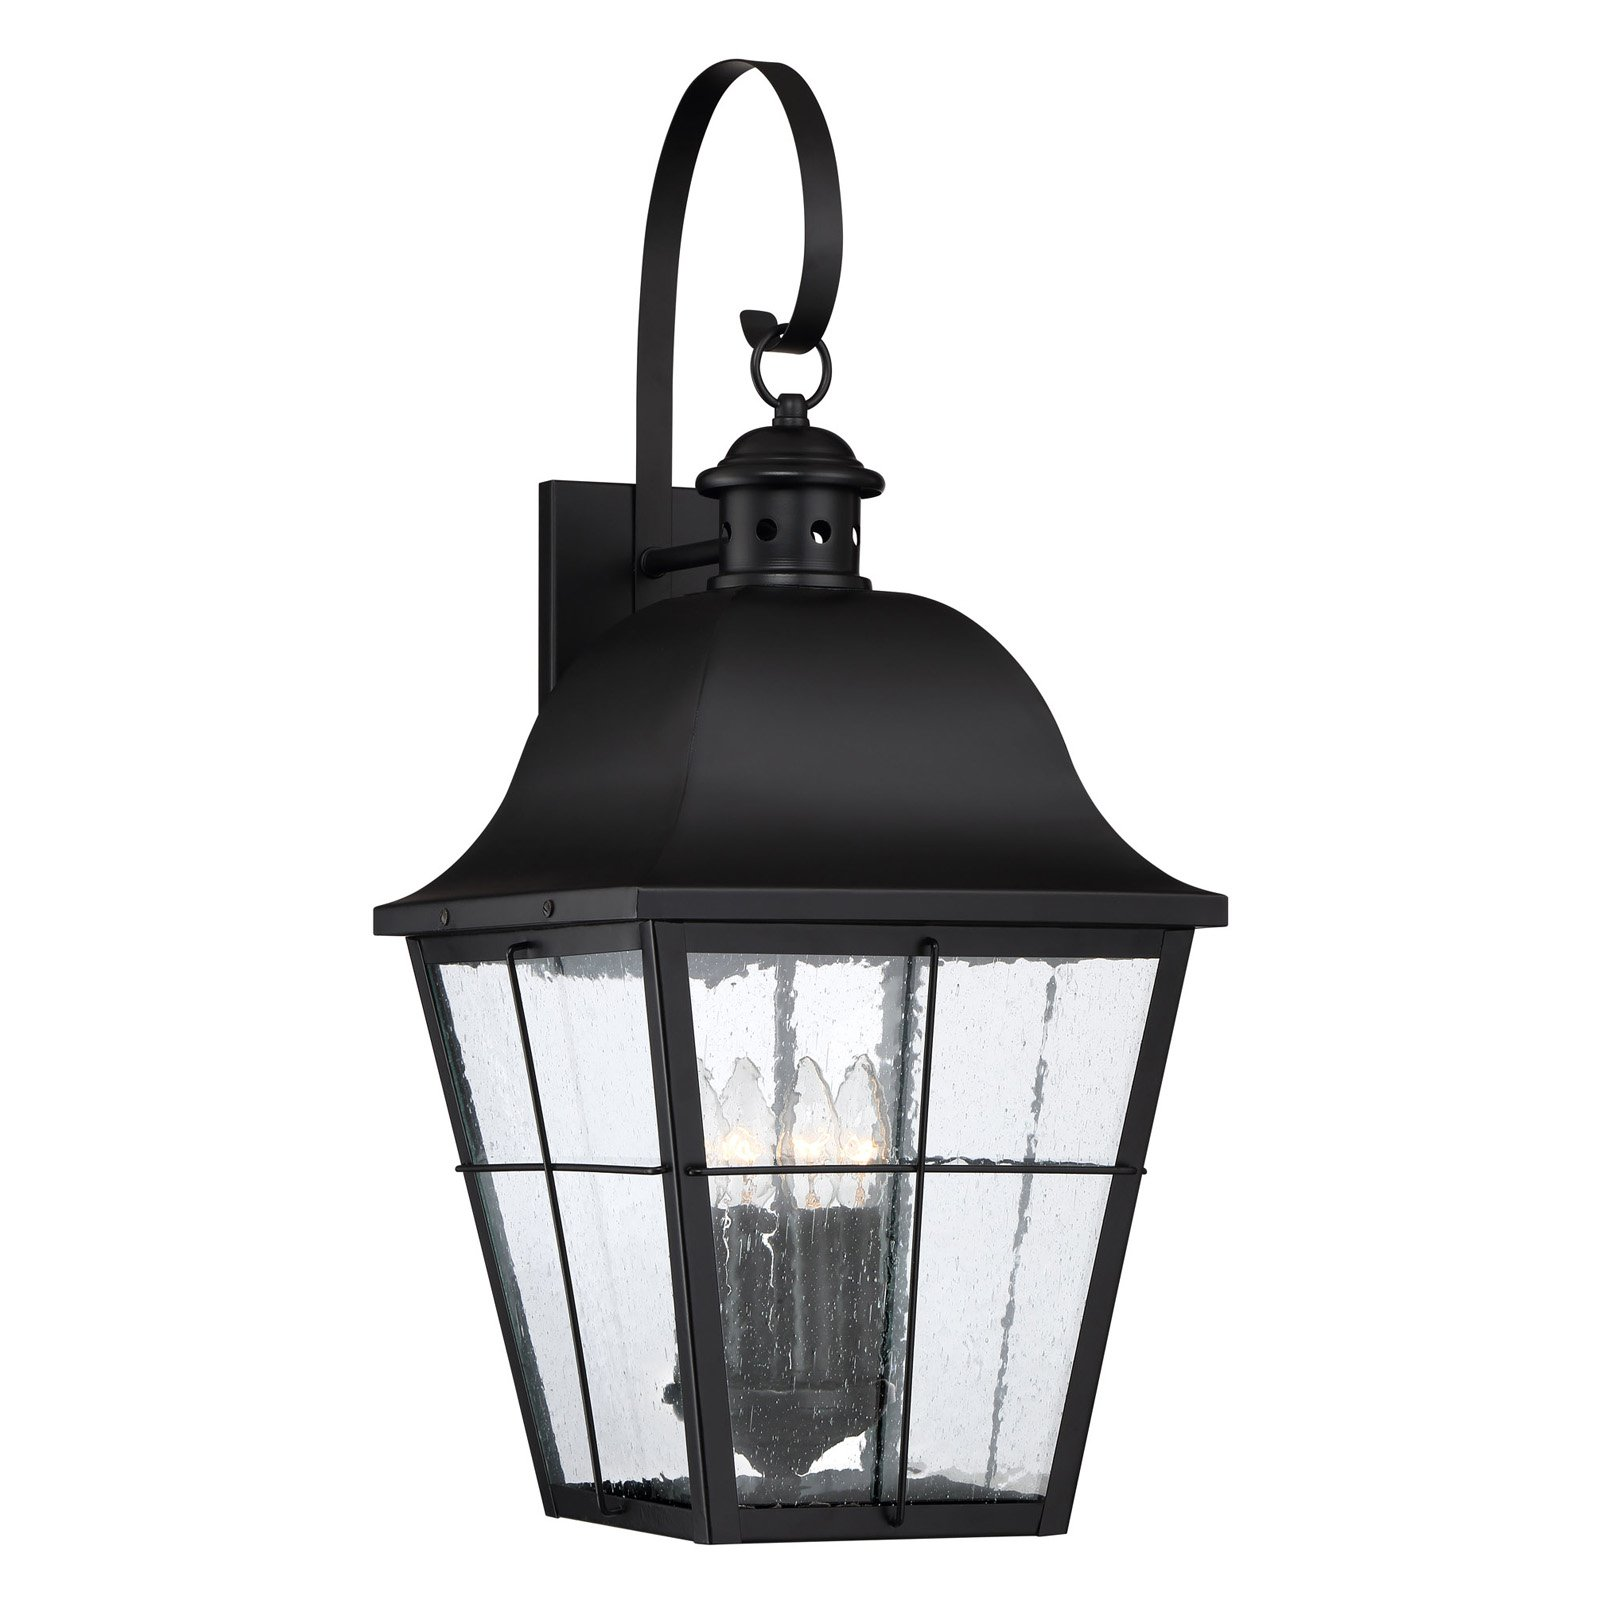 Quoizel Millhouse MHE8412K Outdoor Wall Lantern